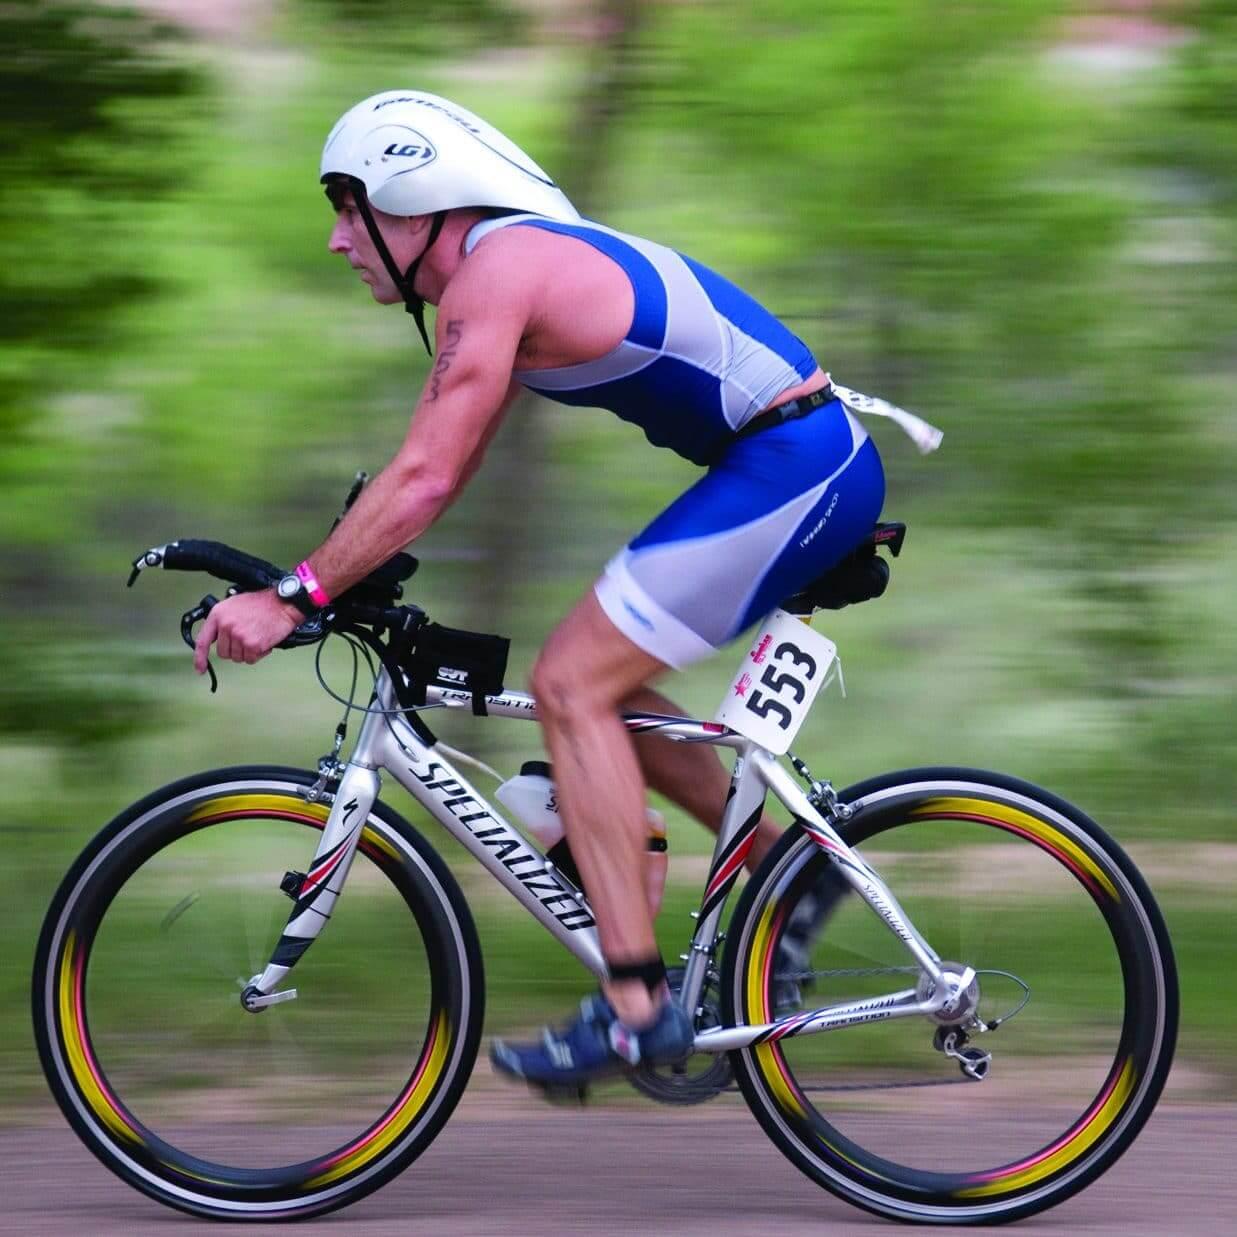 LBK Triathlon